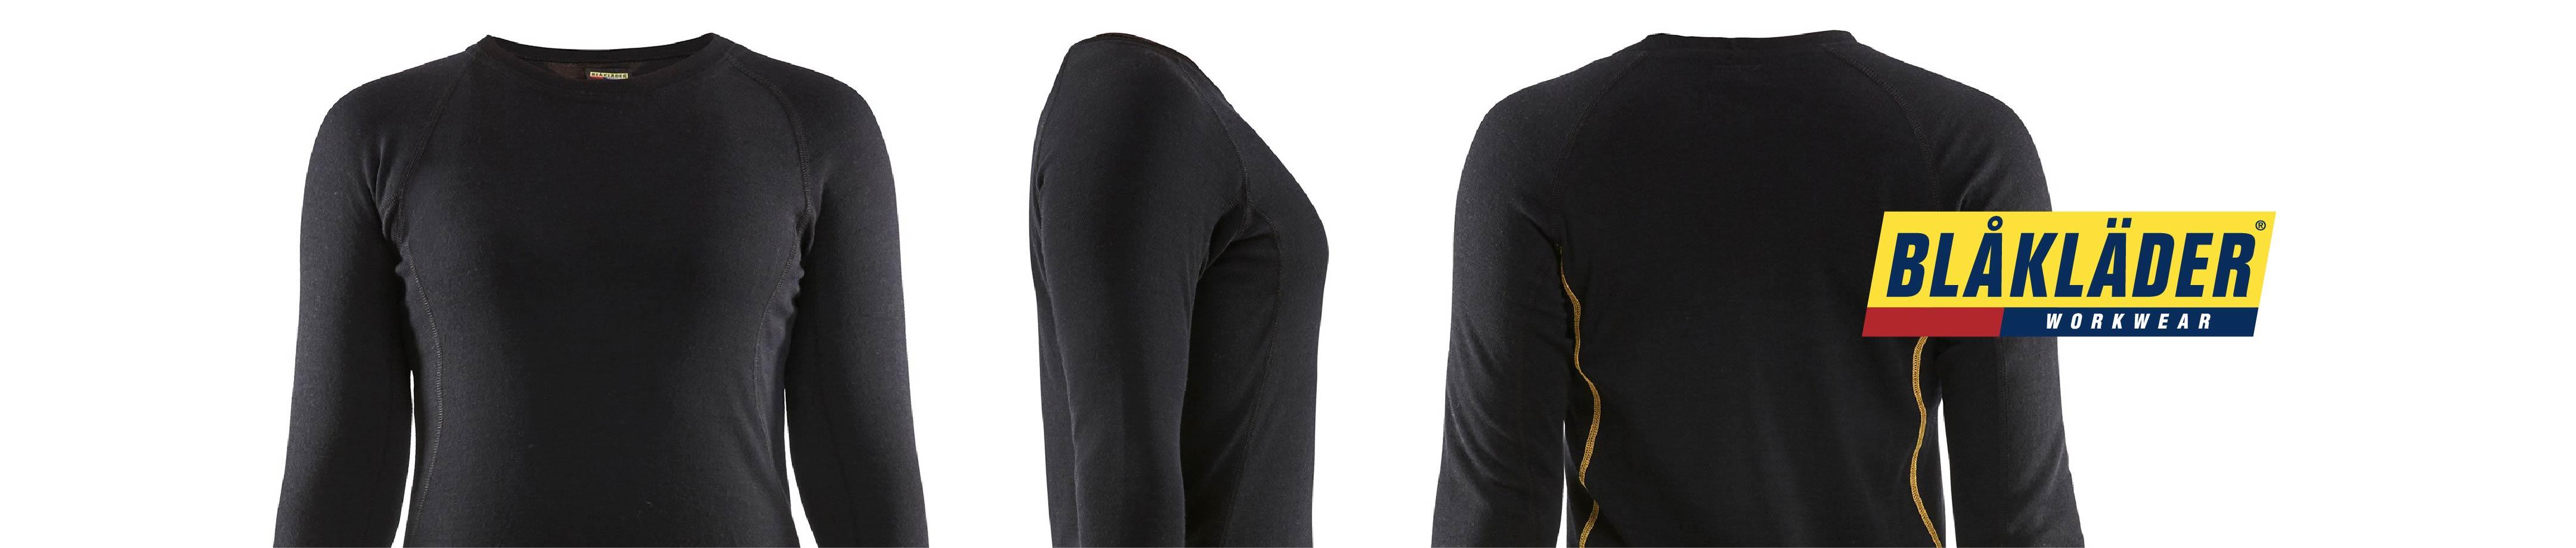 Flame retardant underwear